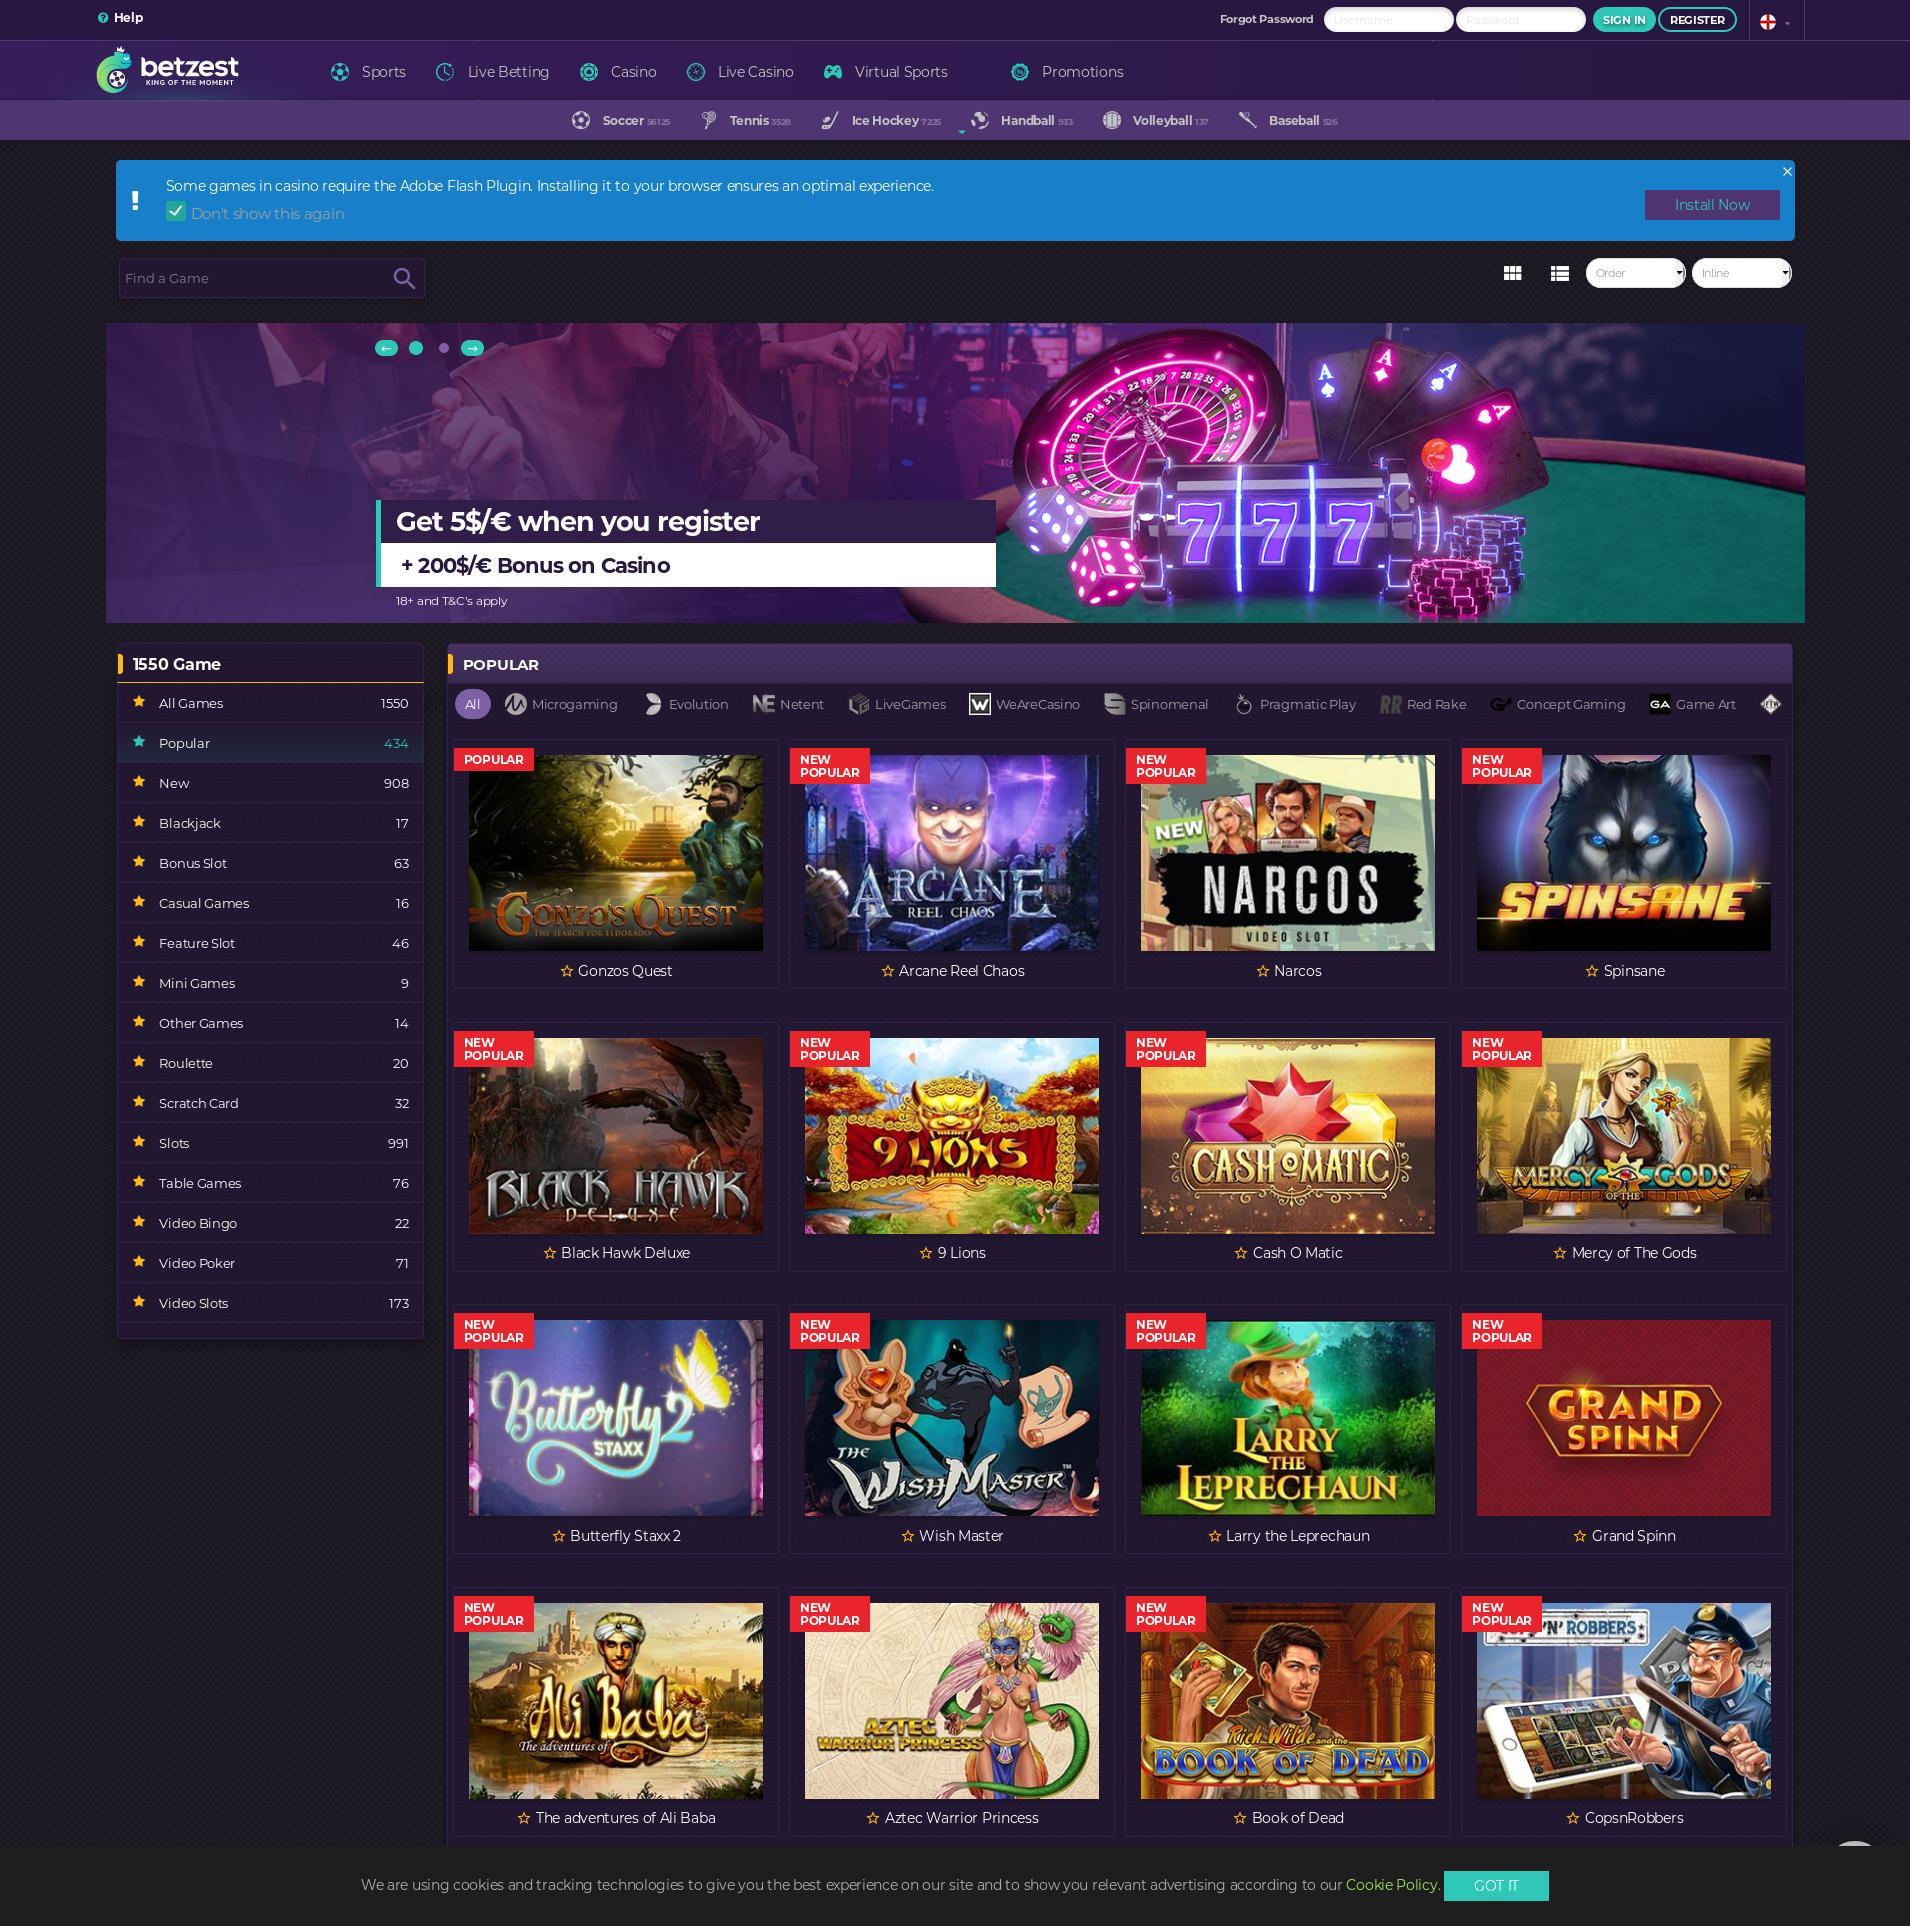 Casino screen Lobby 2019-09-19 for Germany